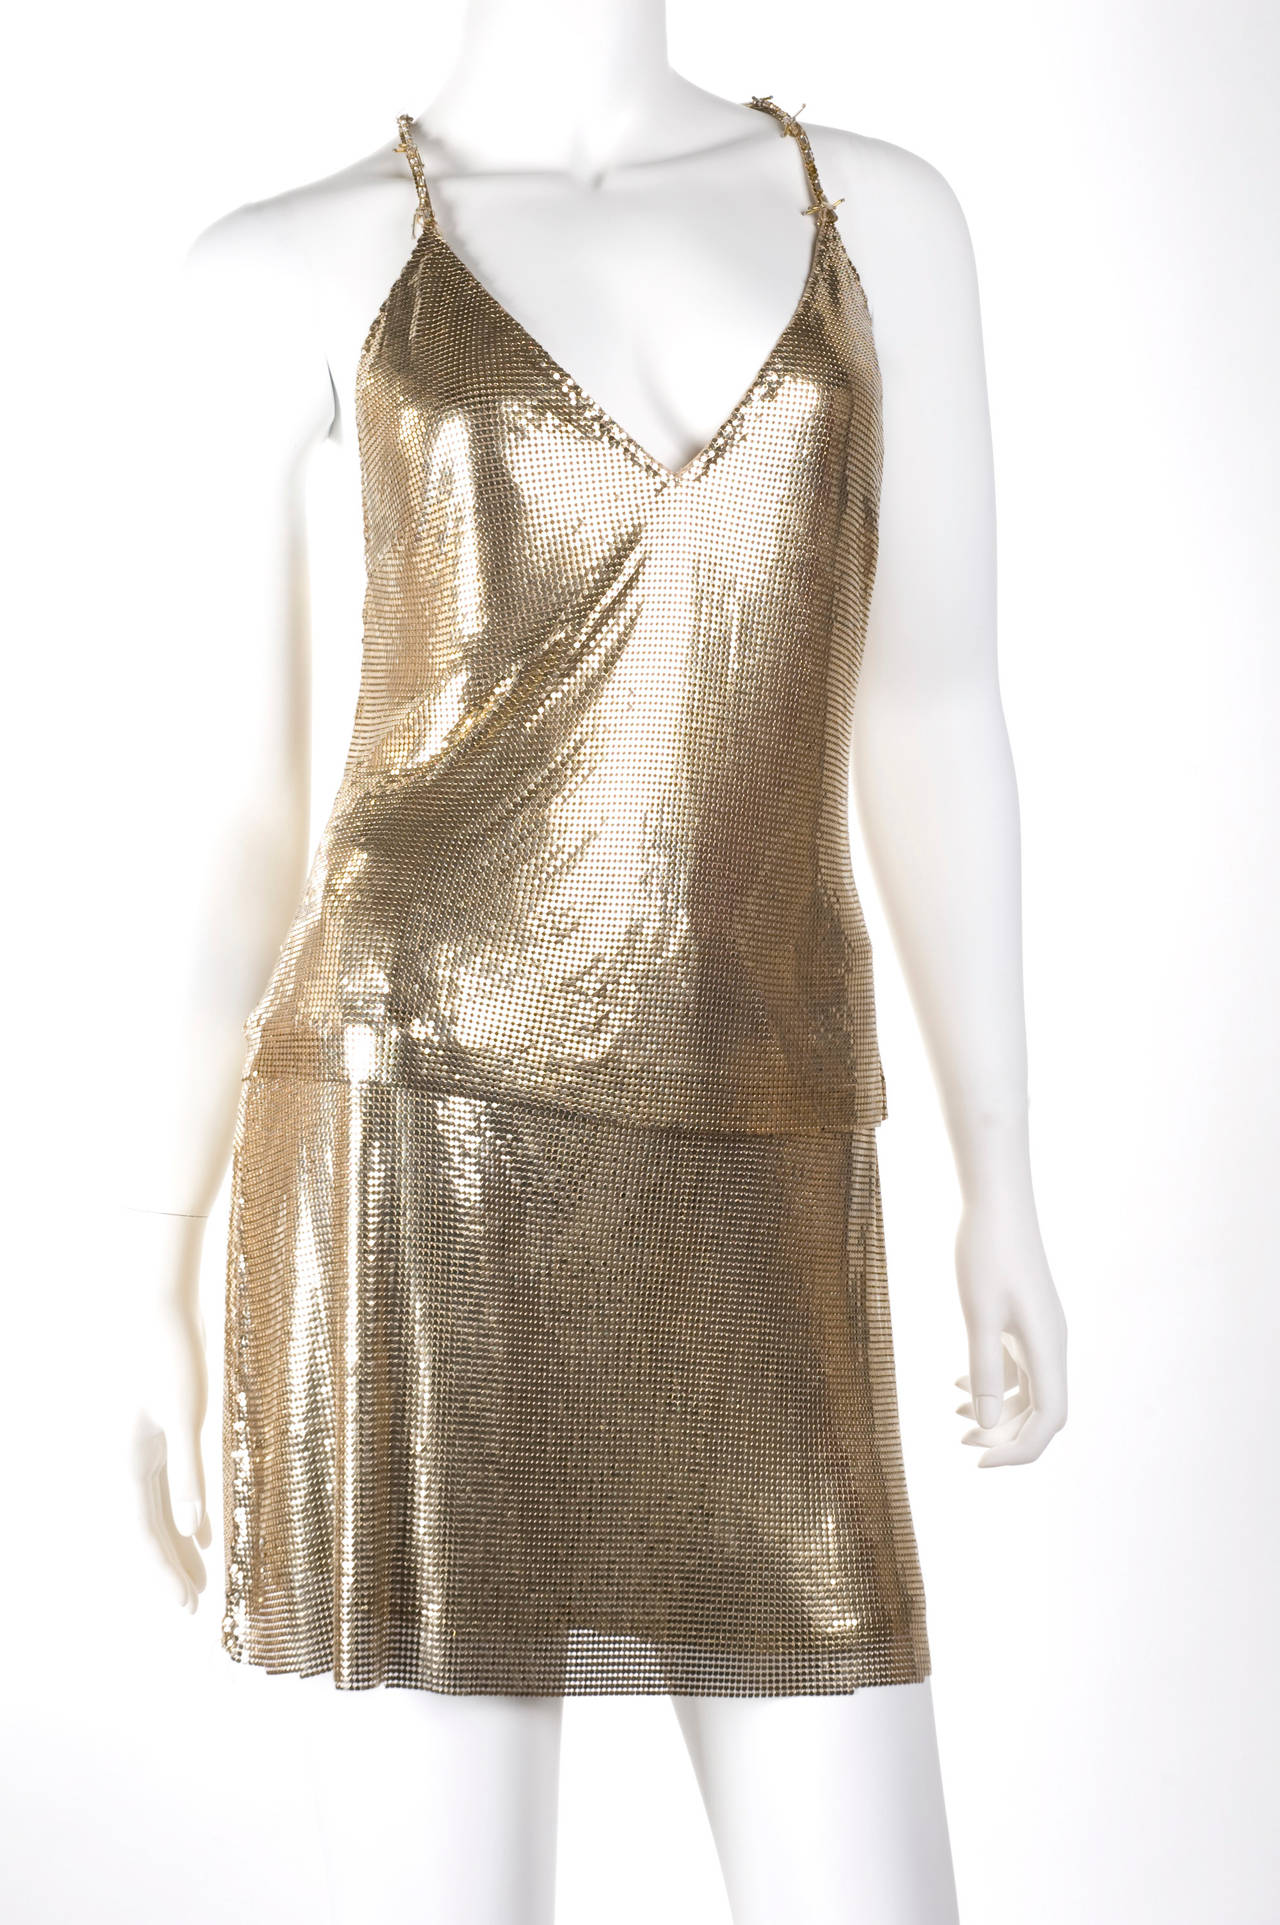 1982 Gianni Versace Couture Metal Mesh Oroton Top and Skirt 5